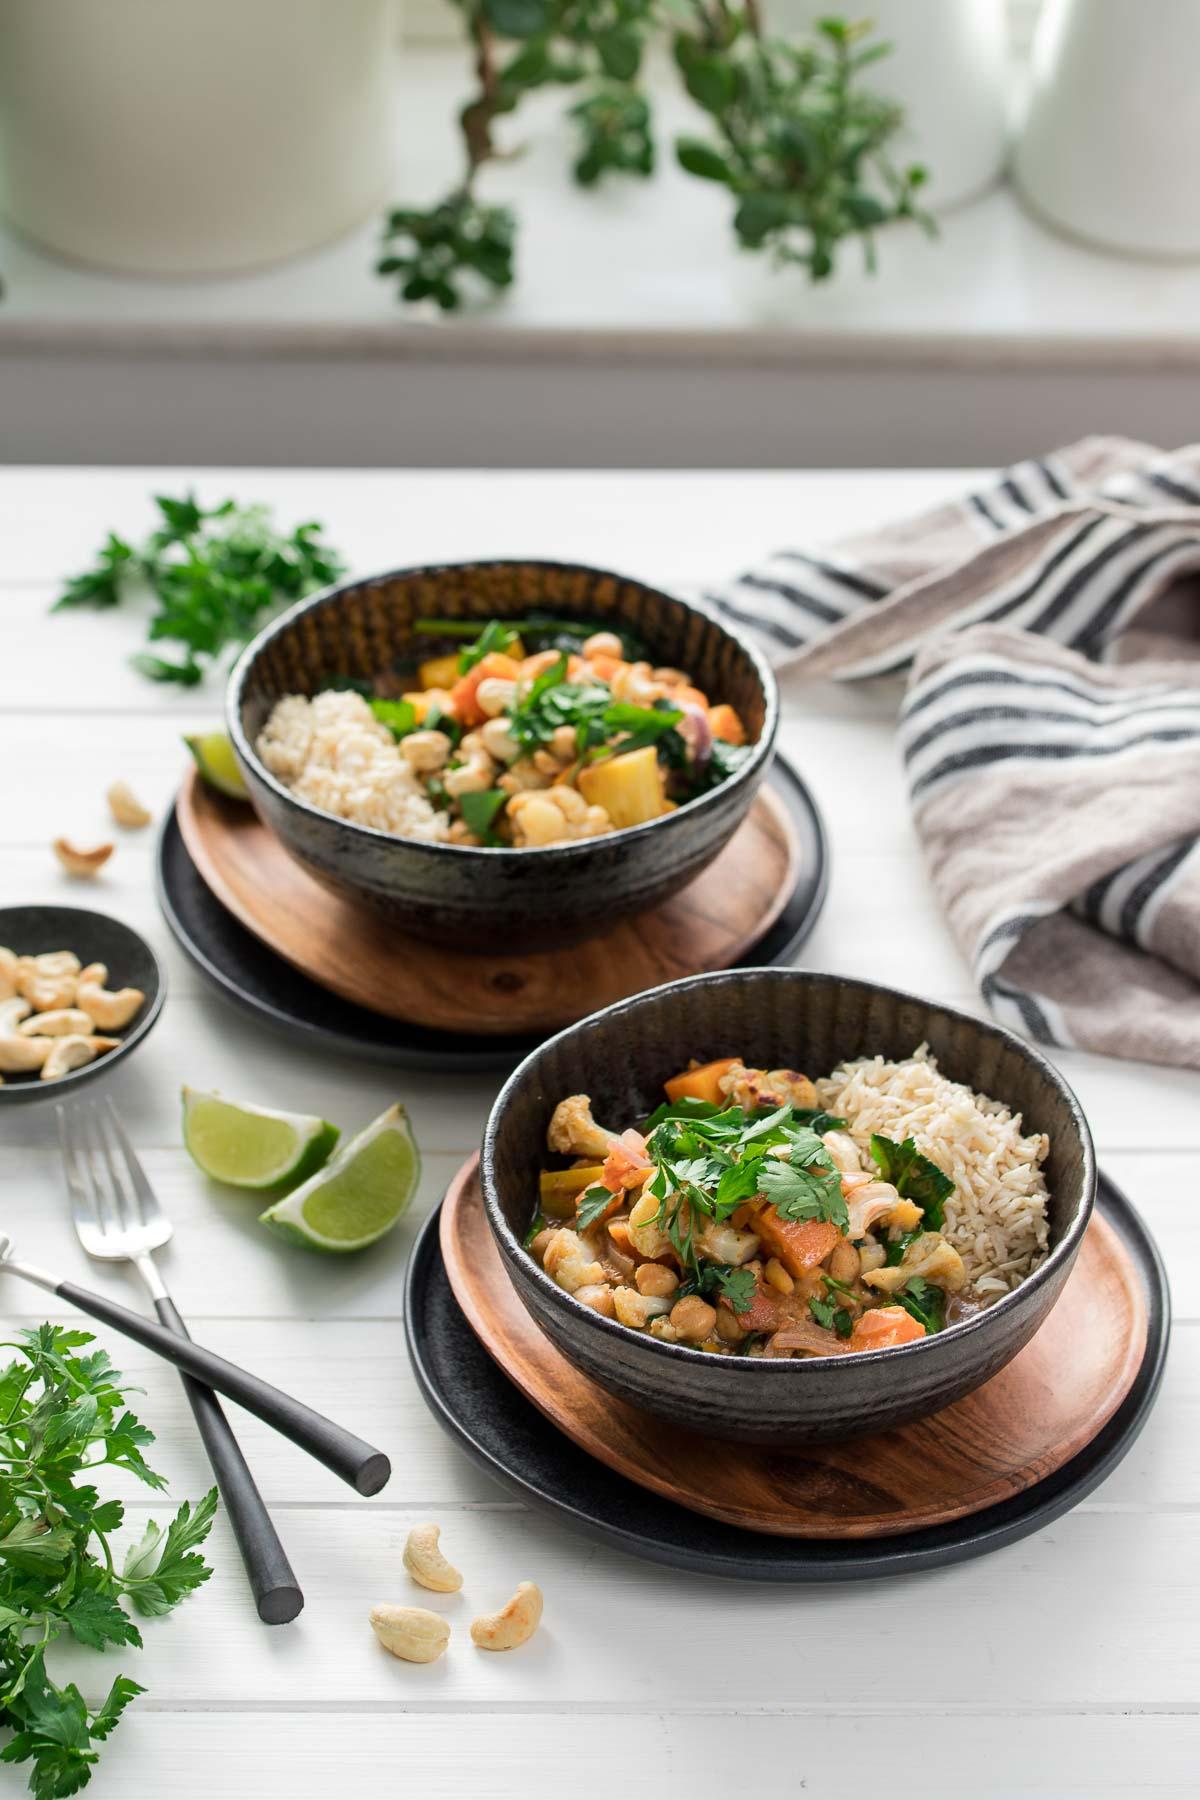 Kokosmilch Korma Curry mit Kichererbsen & geröstetem Gemüse, vegetarisch Rezept